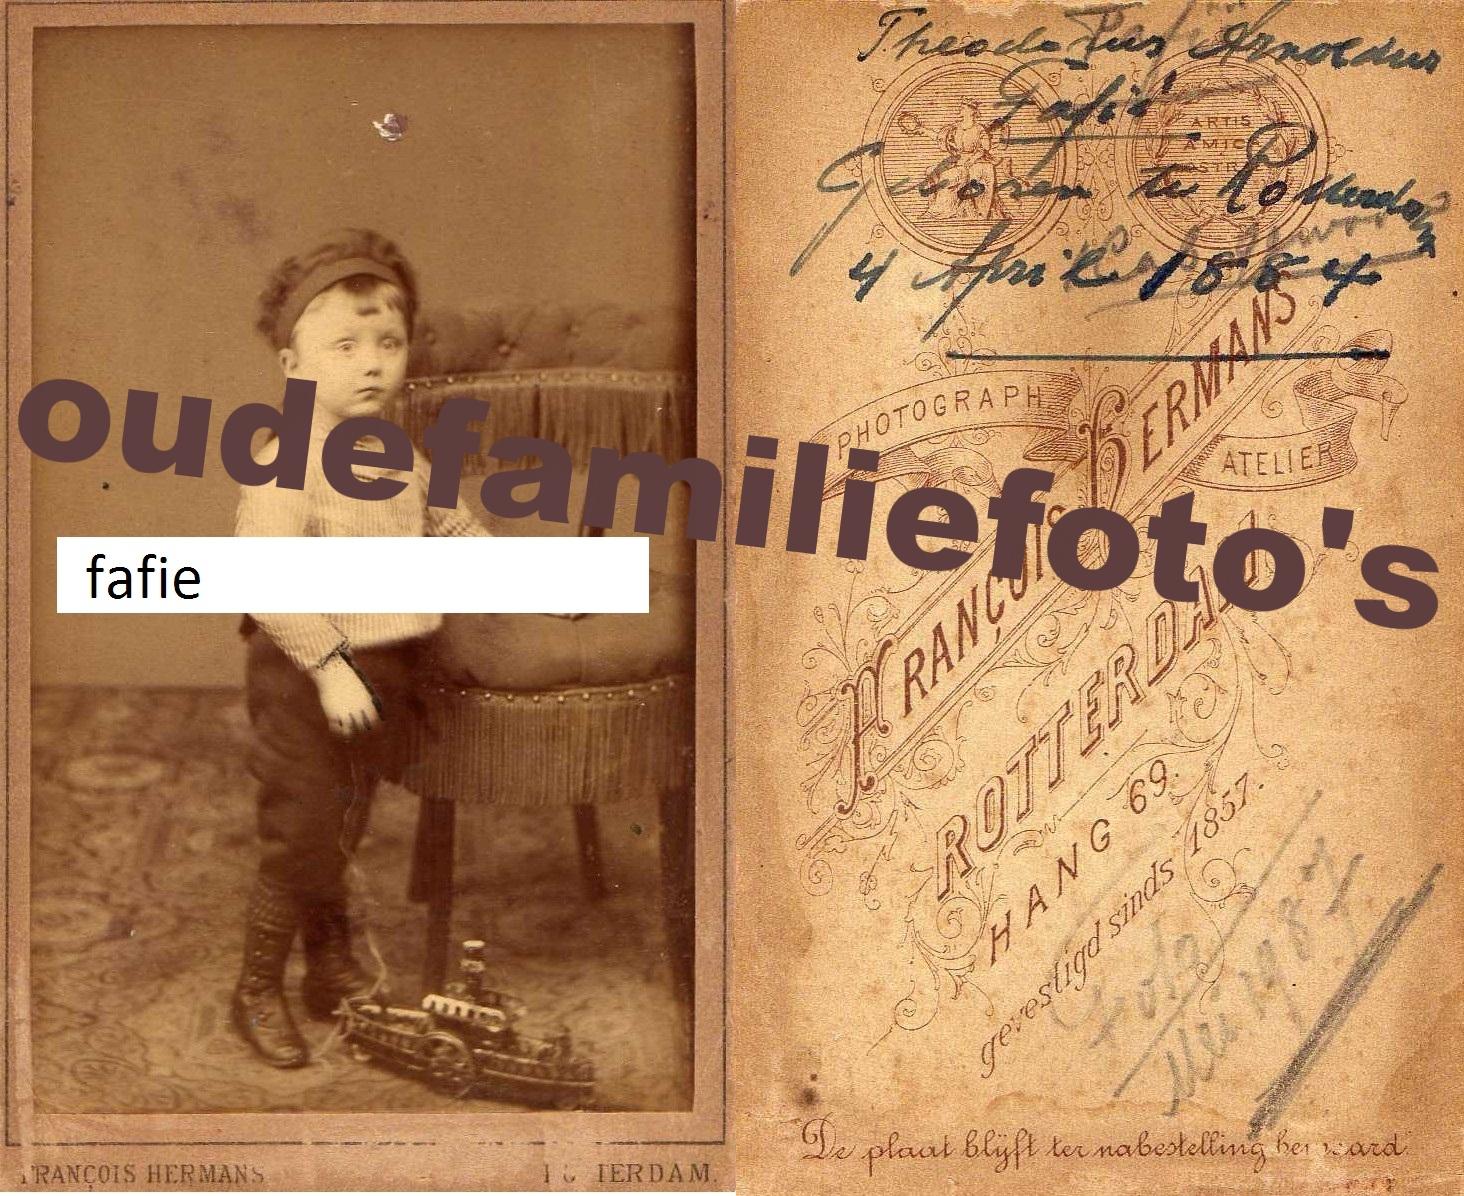 Fafié, Theodorus Arnoldus. Geboren 4 april 1884 Rotterdam € 4,00